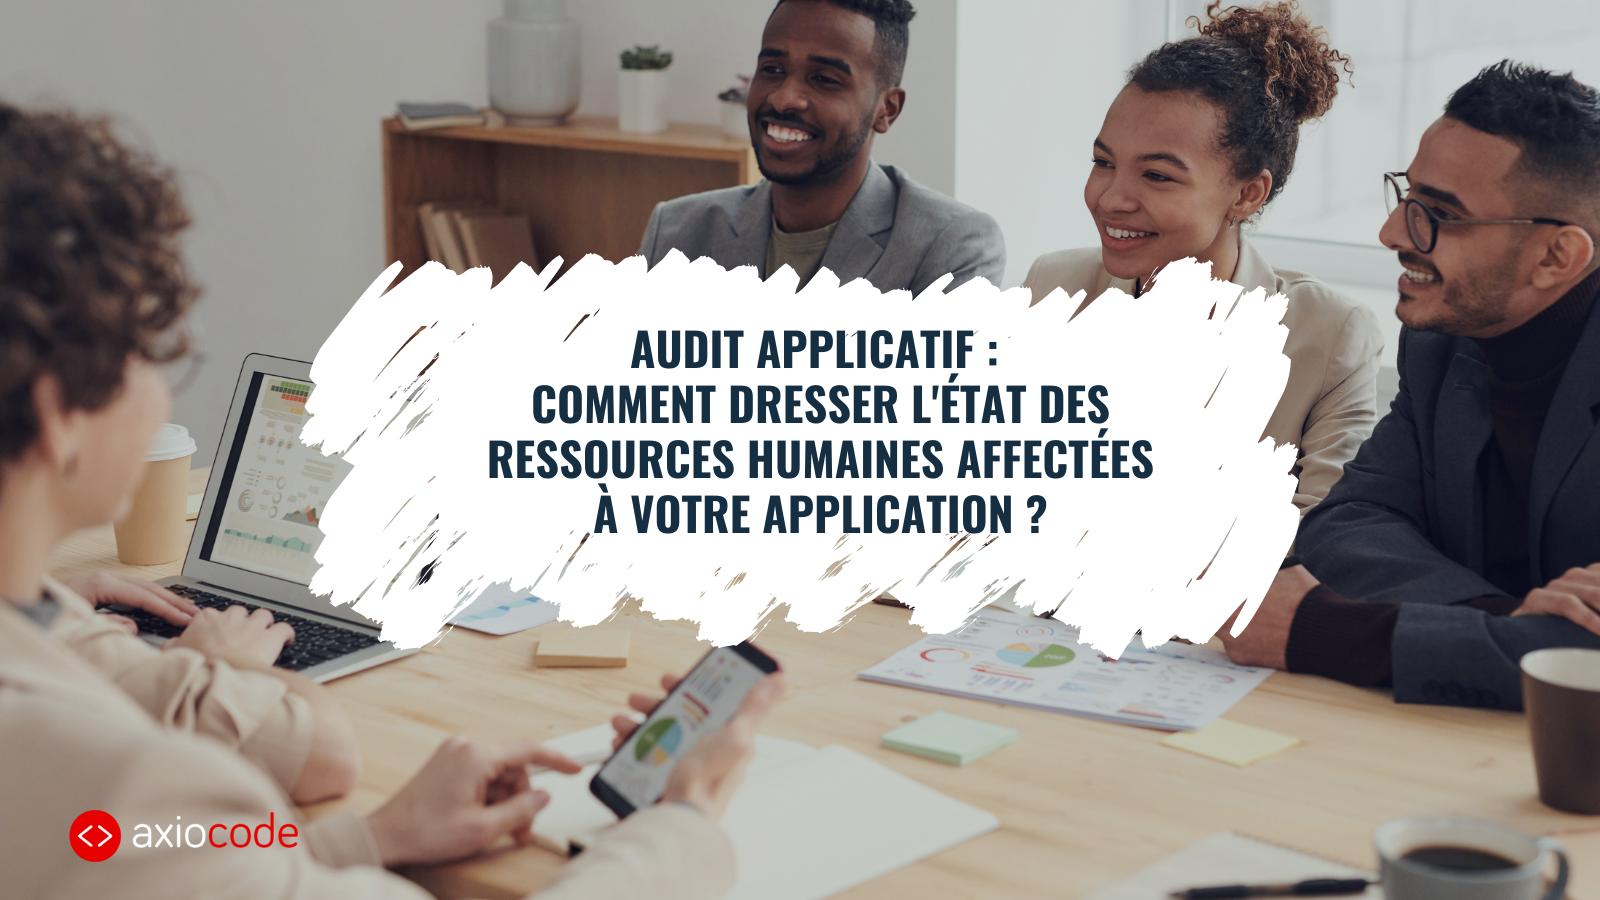 Audit applicatif : Dresser l'état des ressources humaines